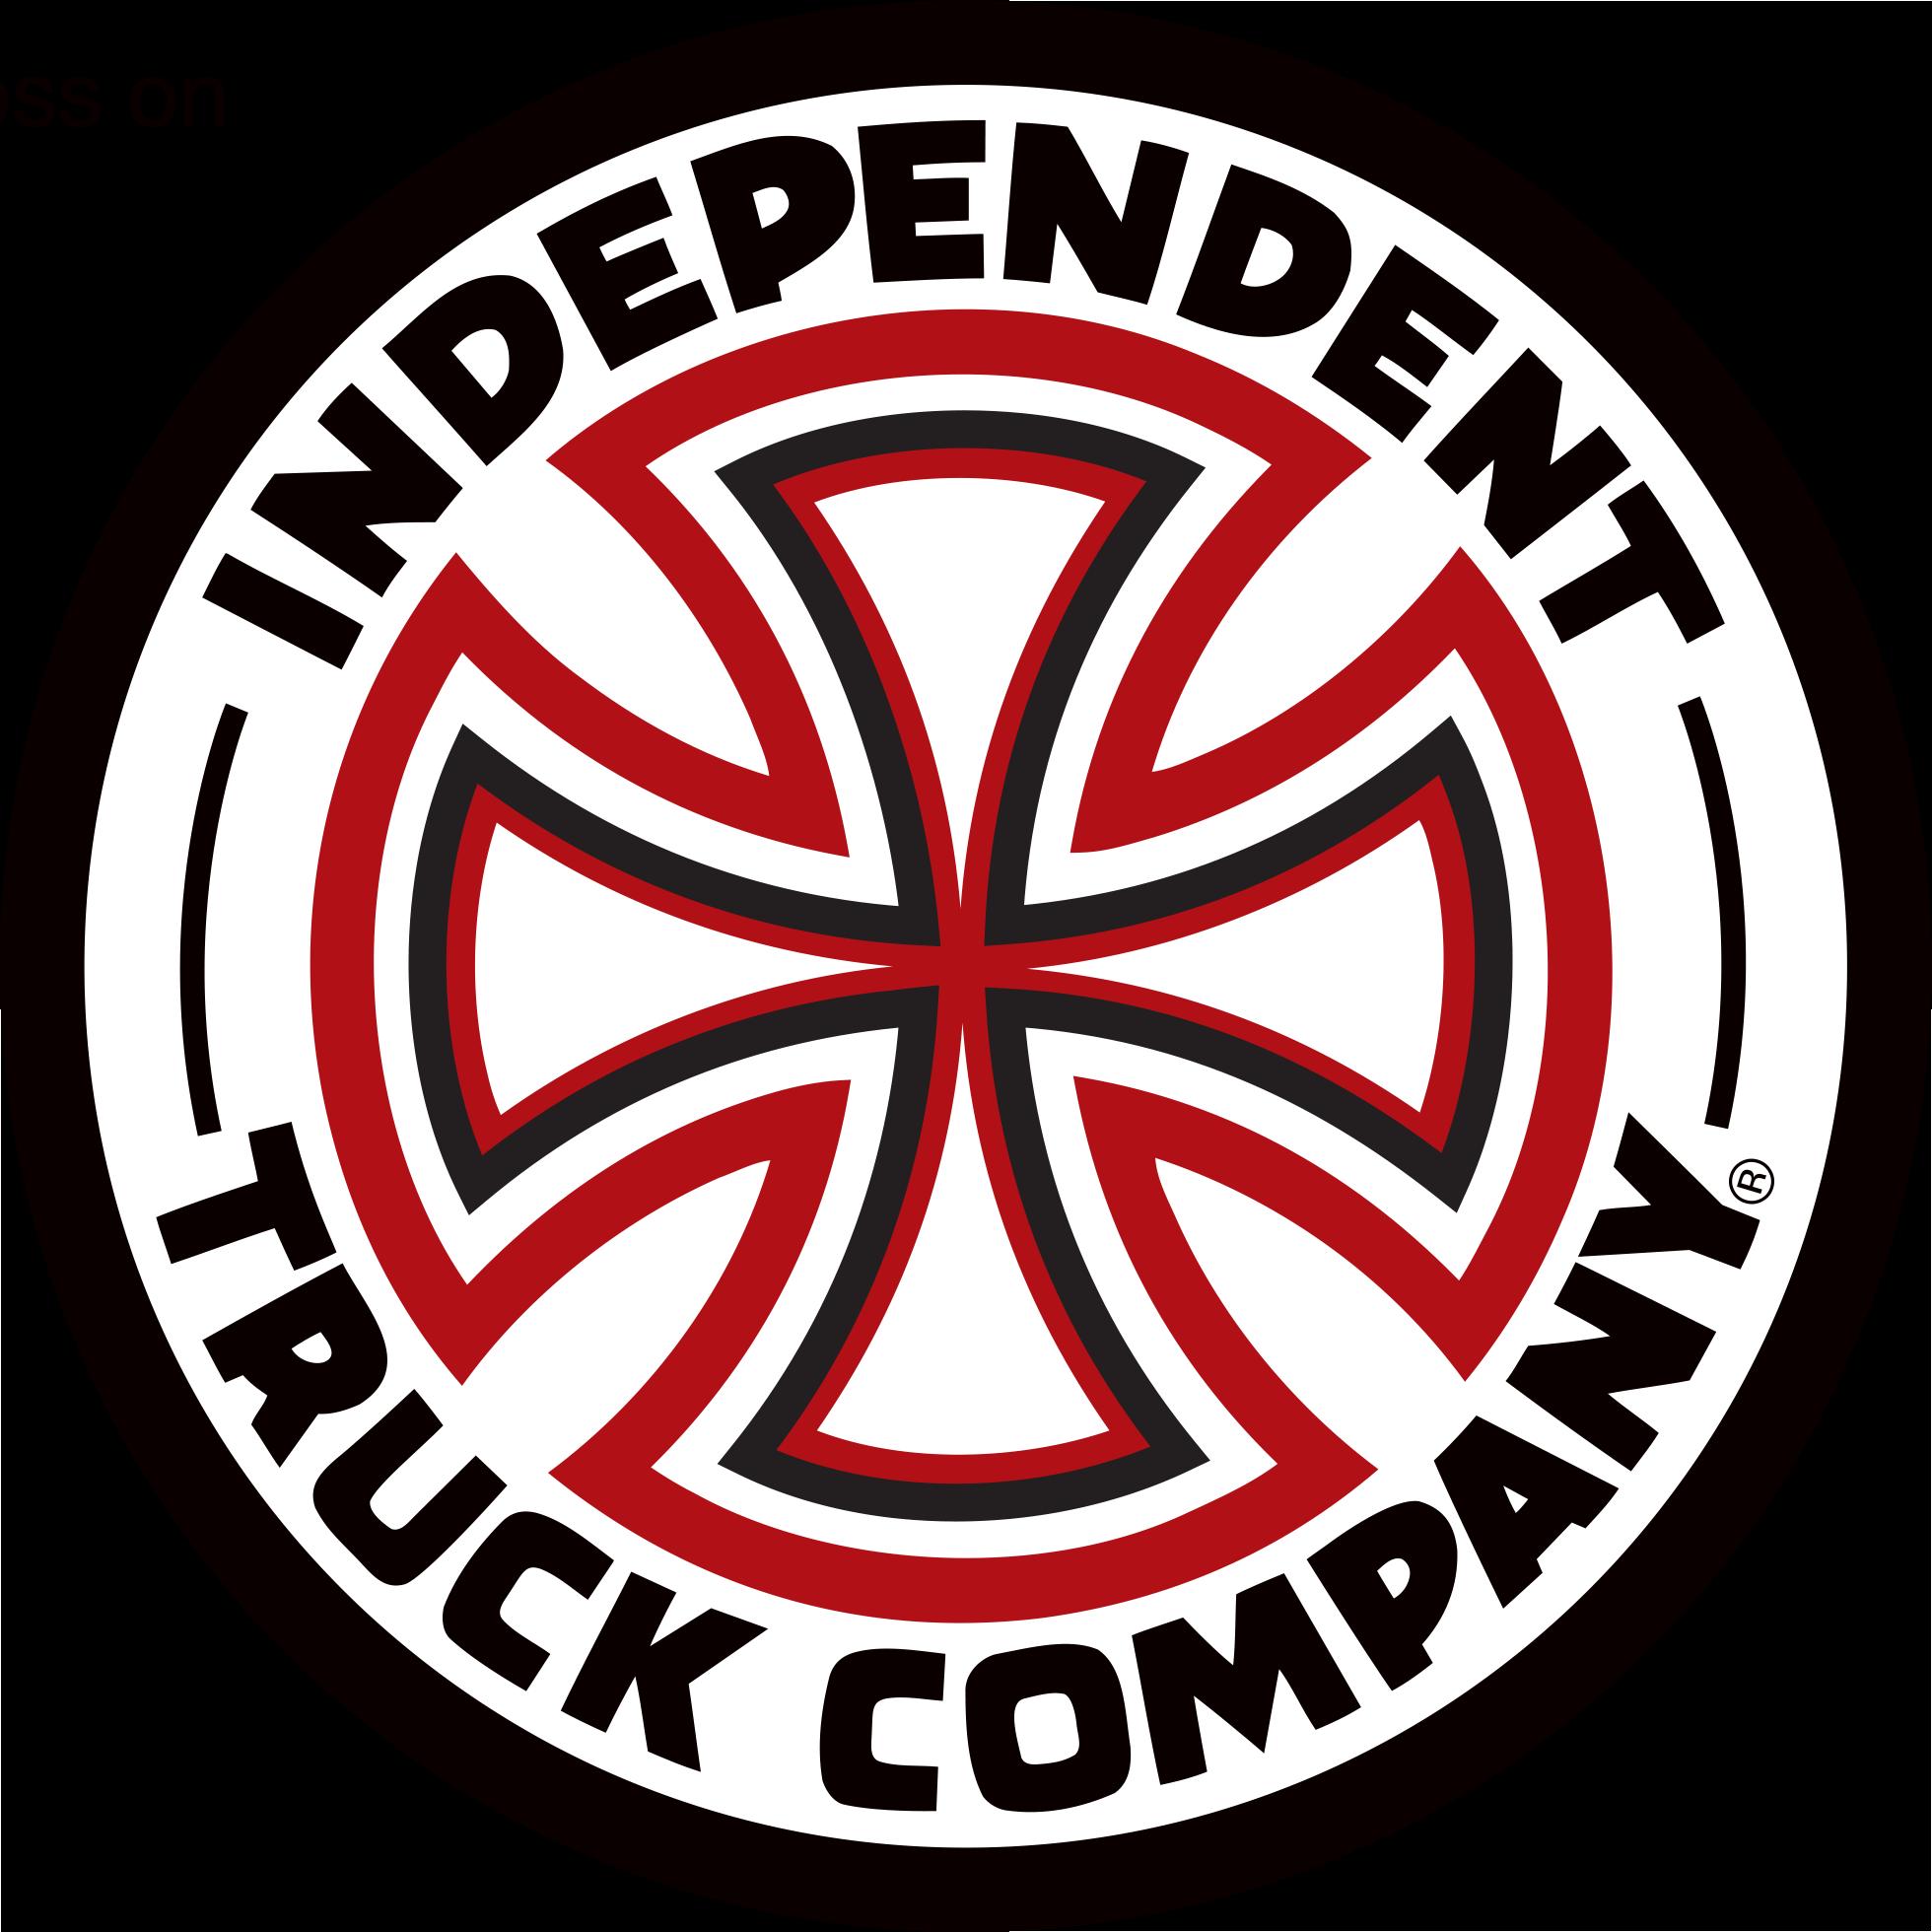 Pin by Jake Baker on Skate and Destroy Skateboard logo